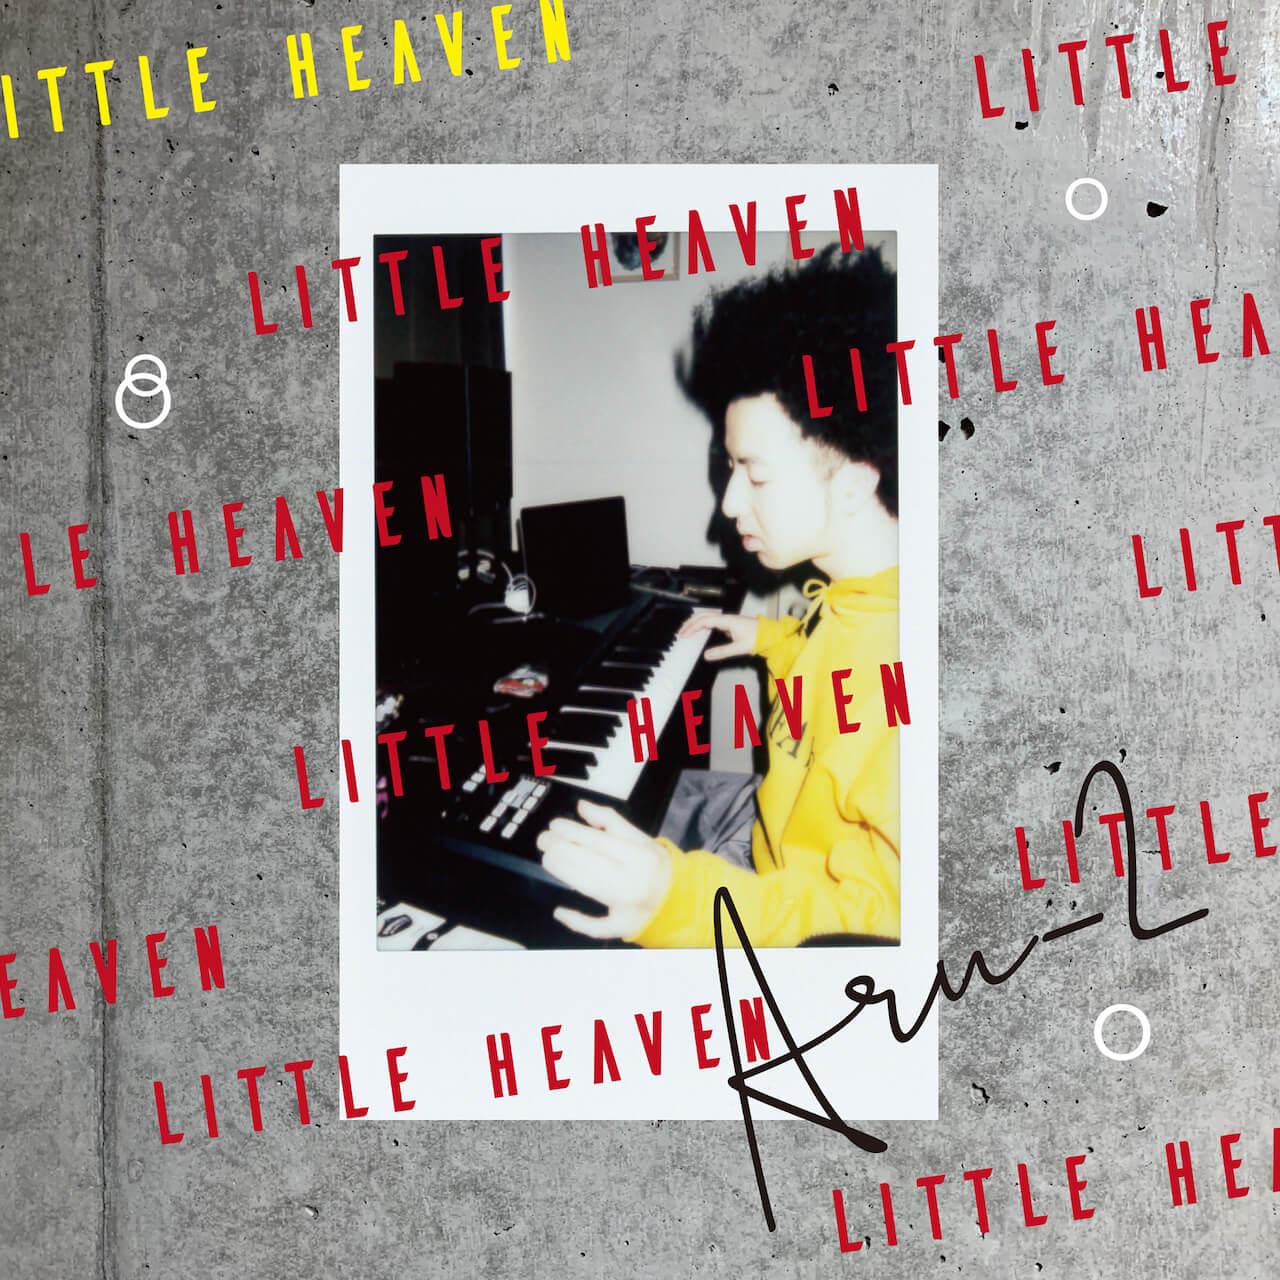 Aru-2によるフル・アルバム『Little Heaven』が6月にリリース|Campanella、KID FRESINOが客演する「Go Away」が本日から先行配信 music200429-aru2-1